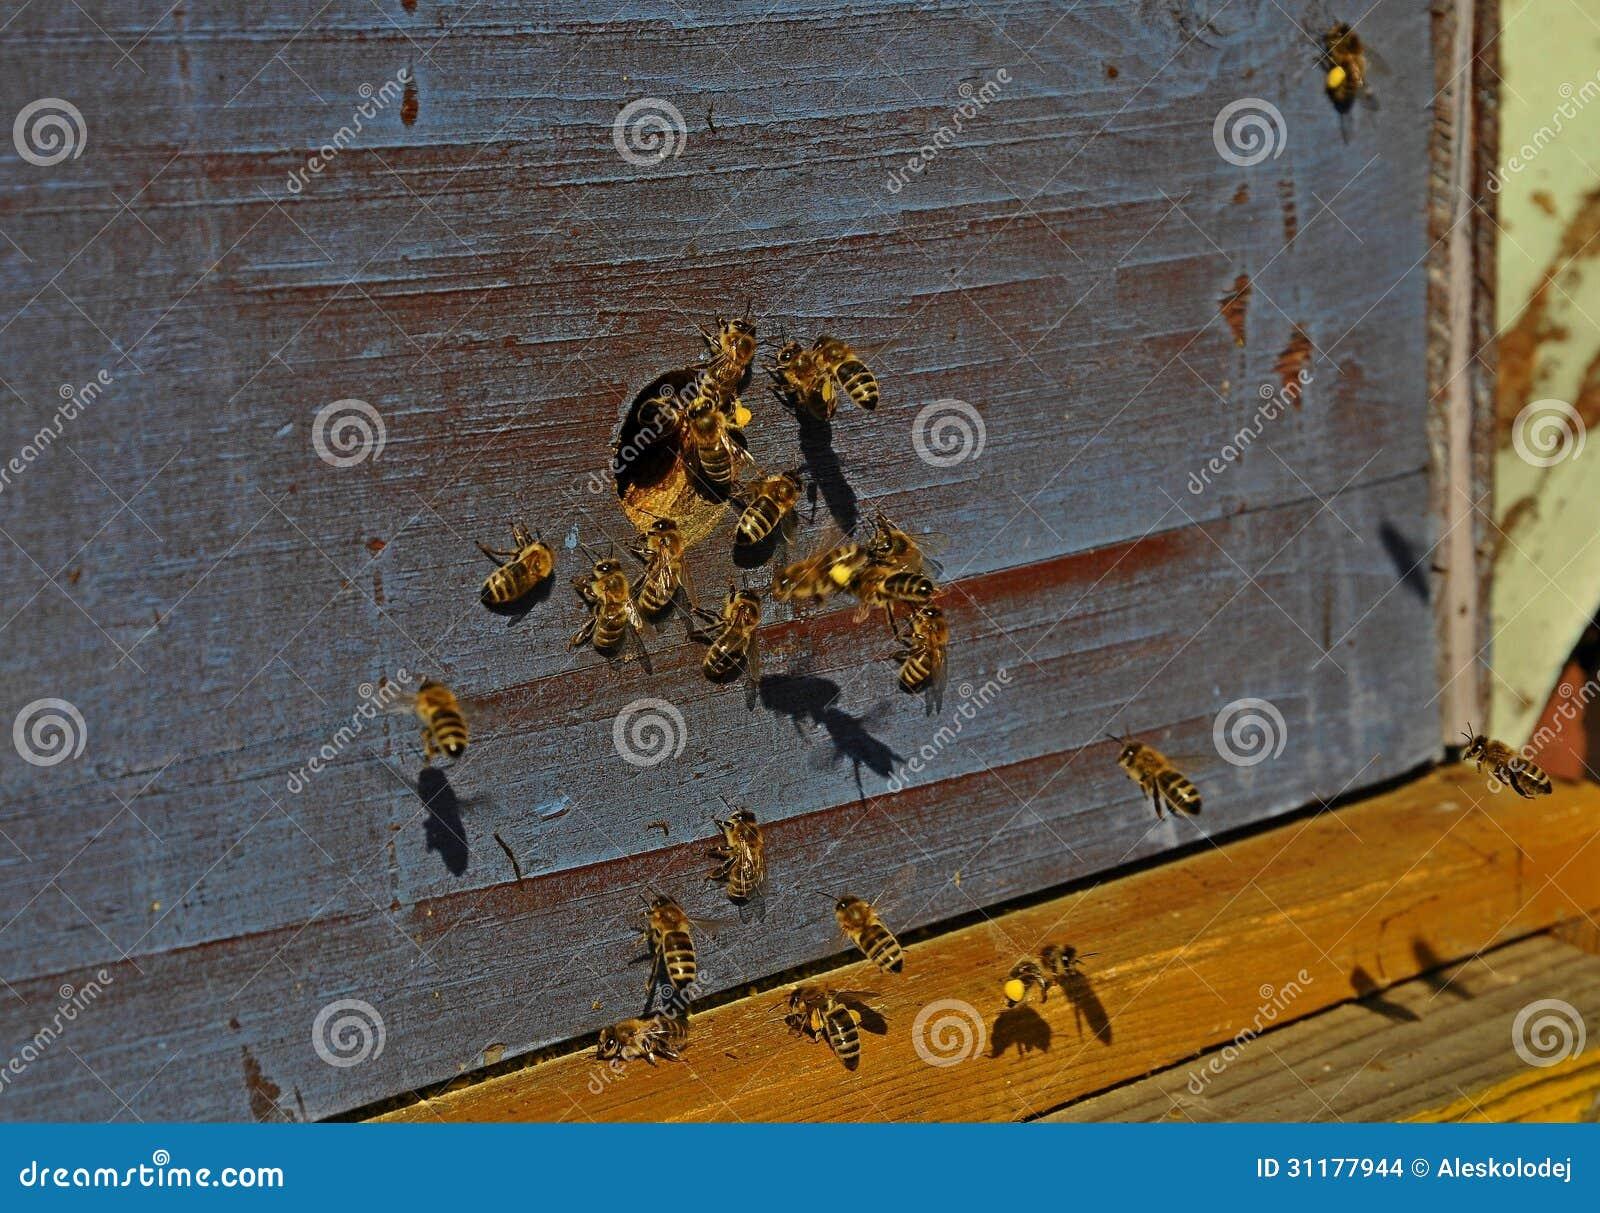 bee spring men Desktop wallpaper spring, peach, bee hd for pc & mac, laptop, tablet, mobile phone.